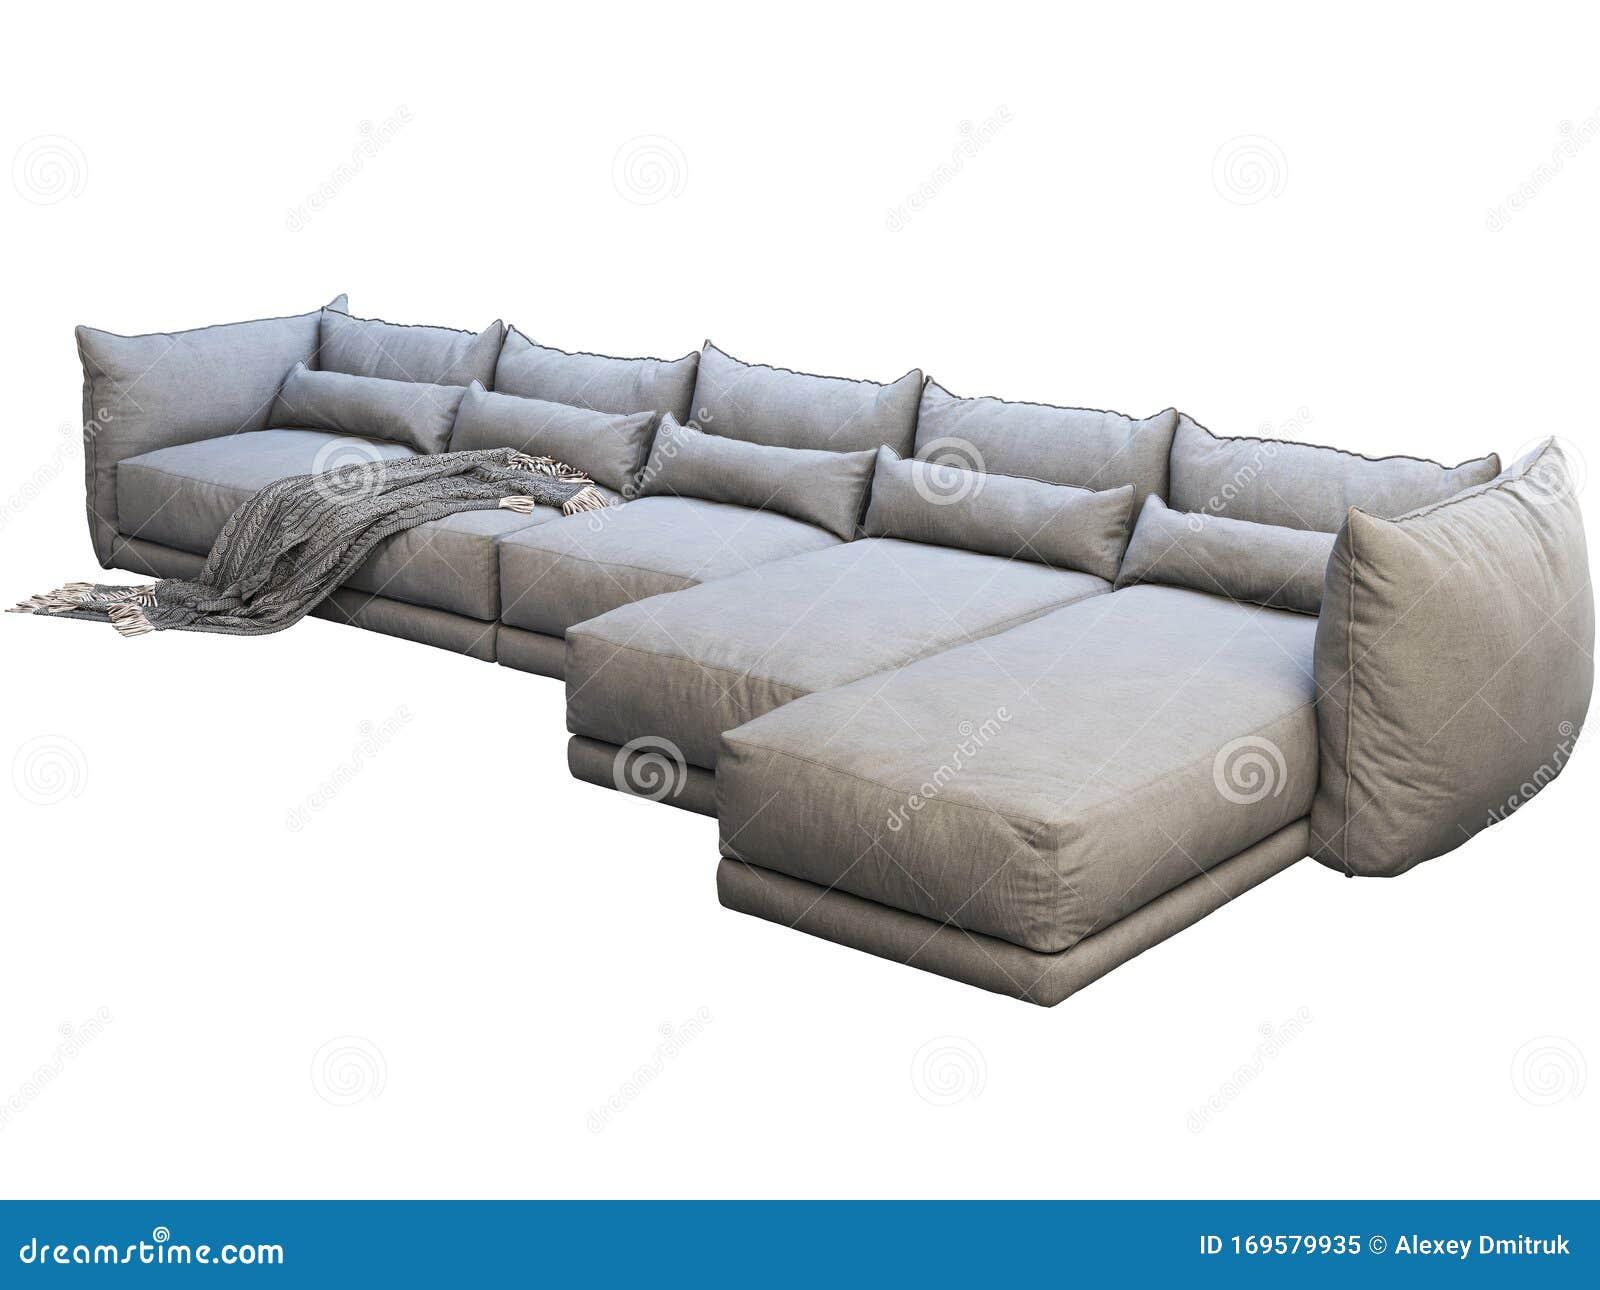 Modern Huge Gray Corner Fabric Sofa With Chaise Lounge 3d Render Stock Illustration Illustration Of Wrinkles Comfort 169579935